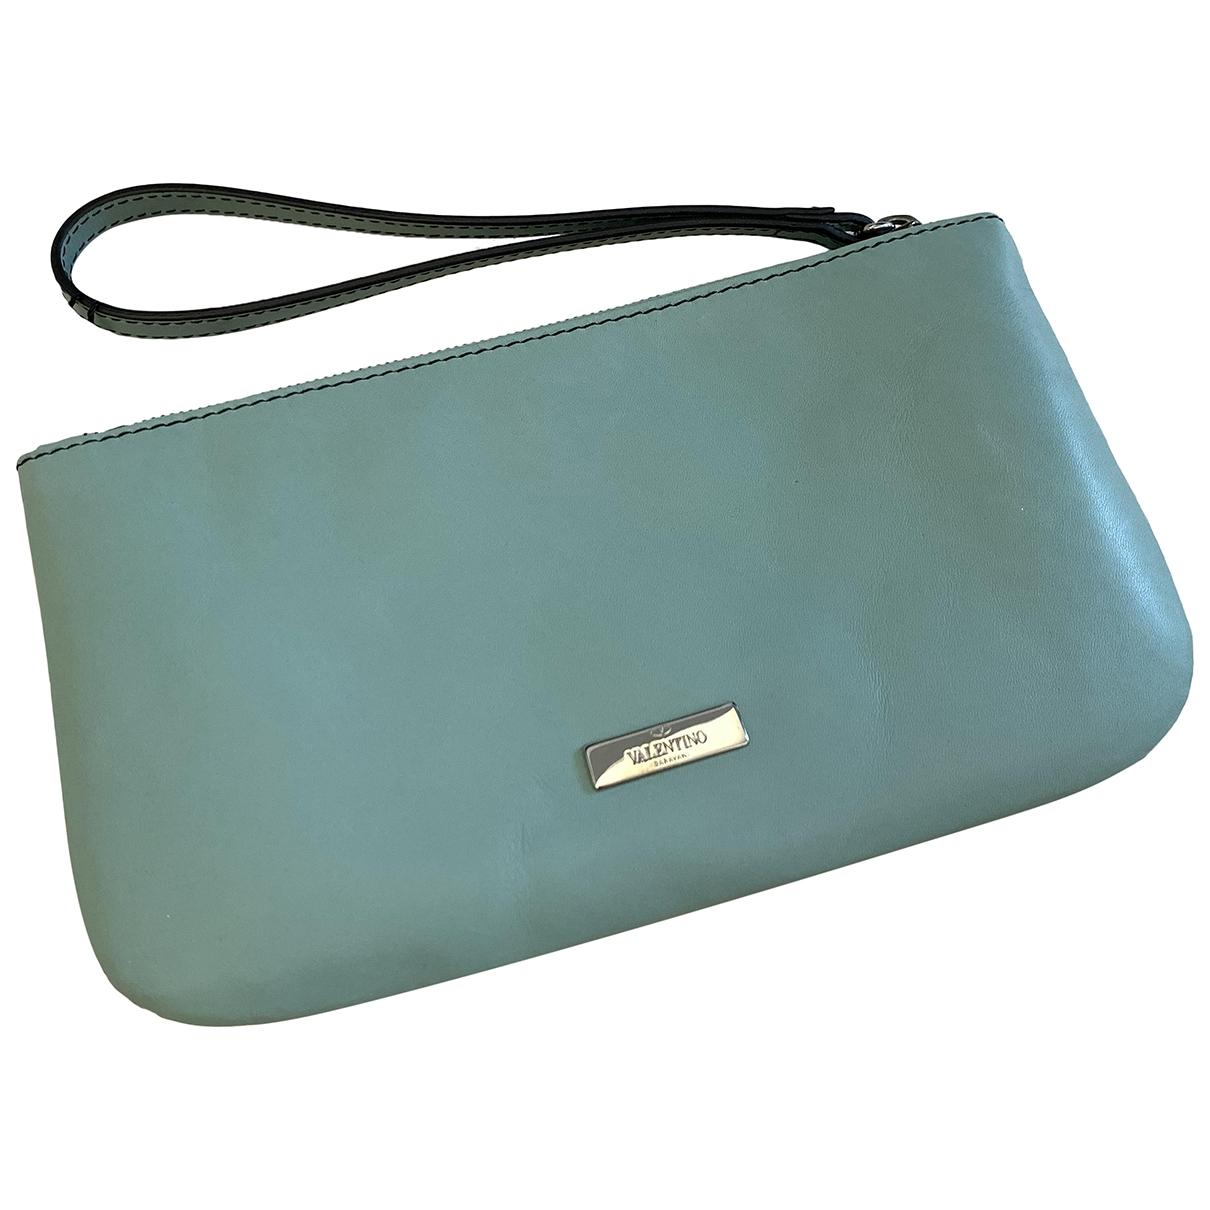 Valentino Garavani \N Leather Clutch bag for Women \N